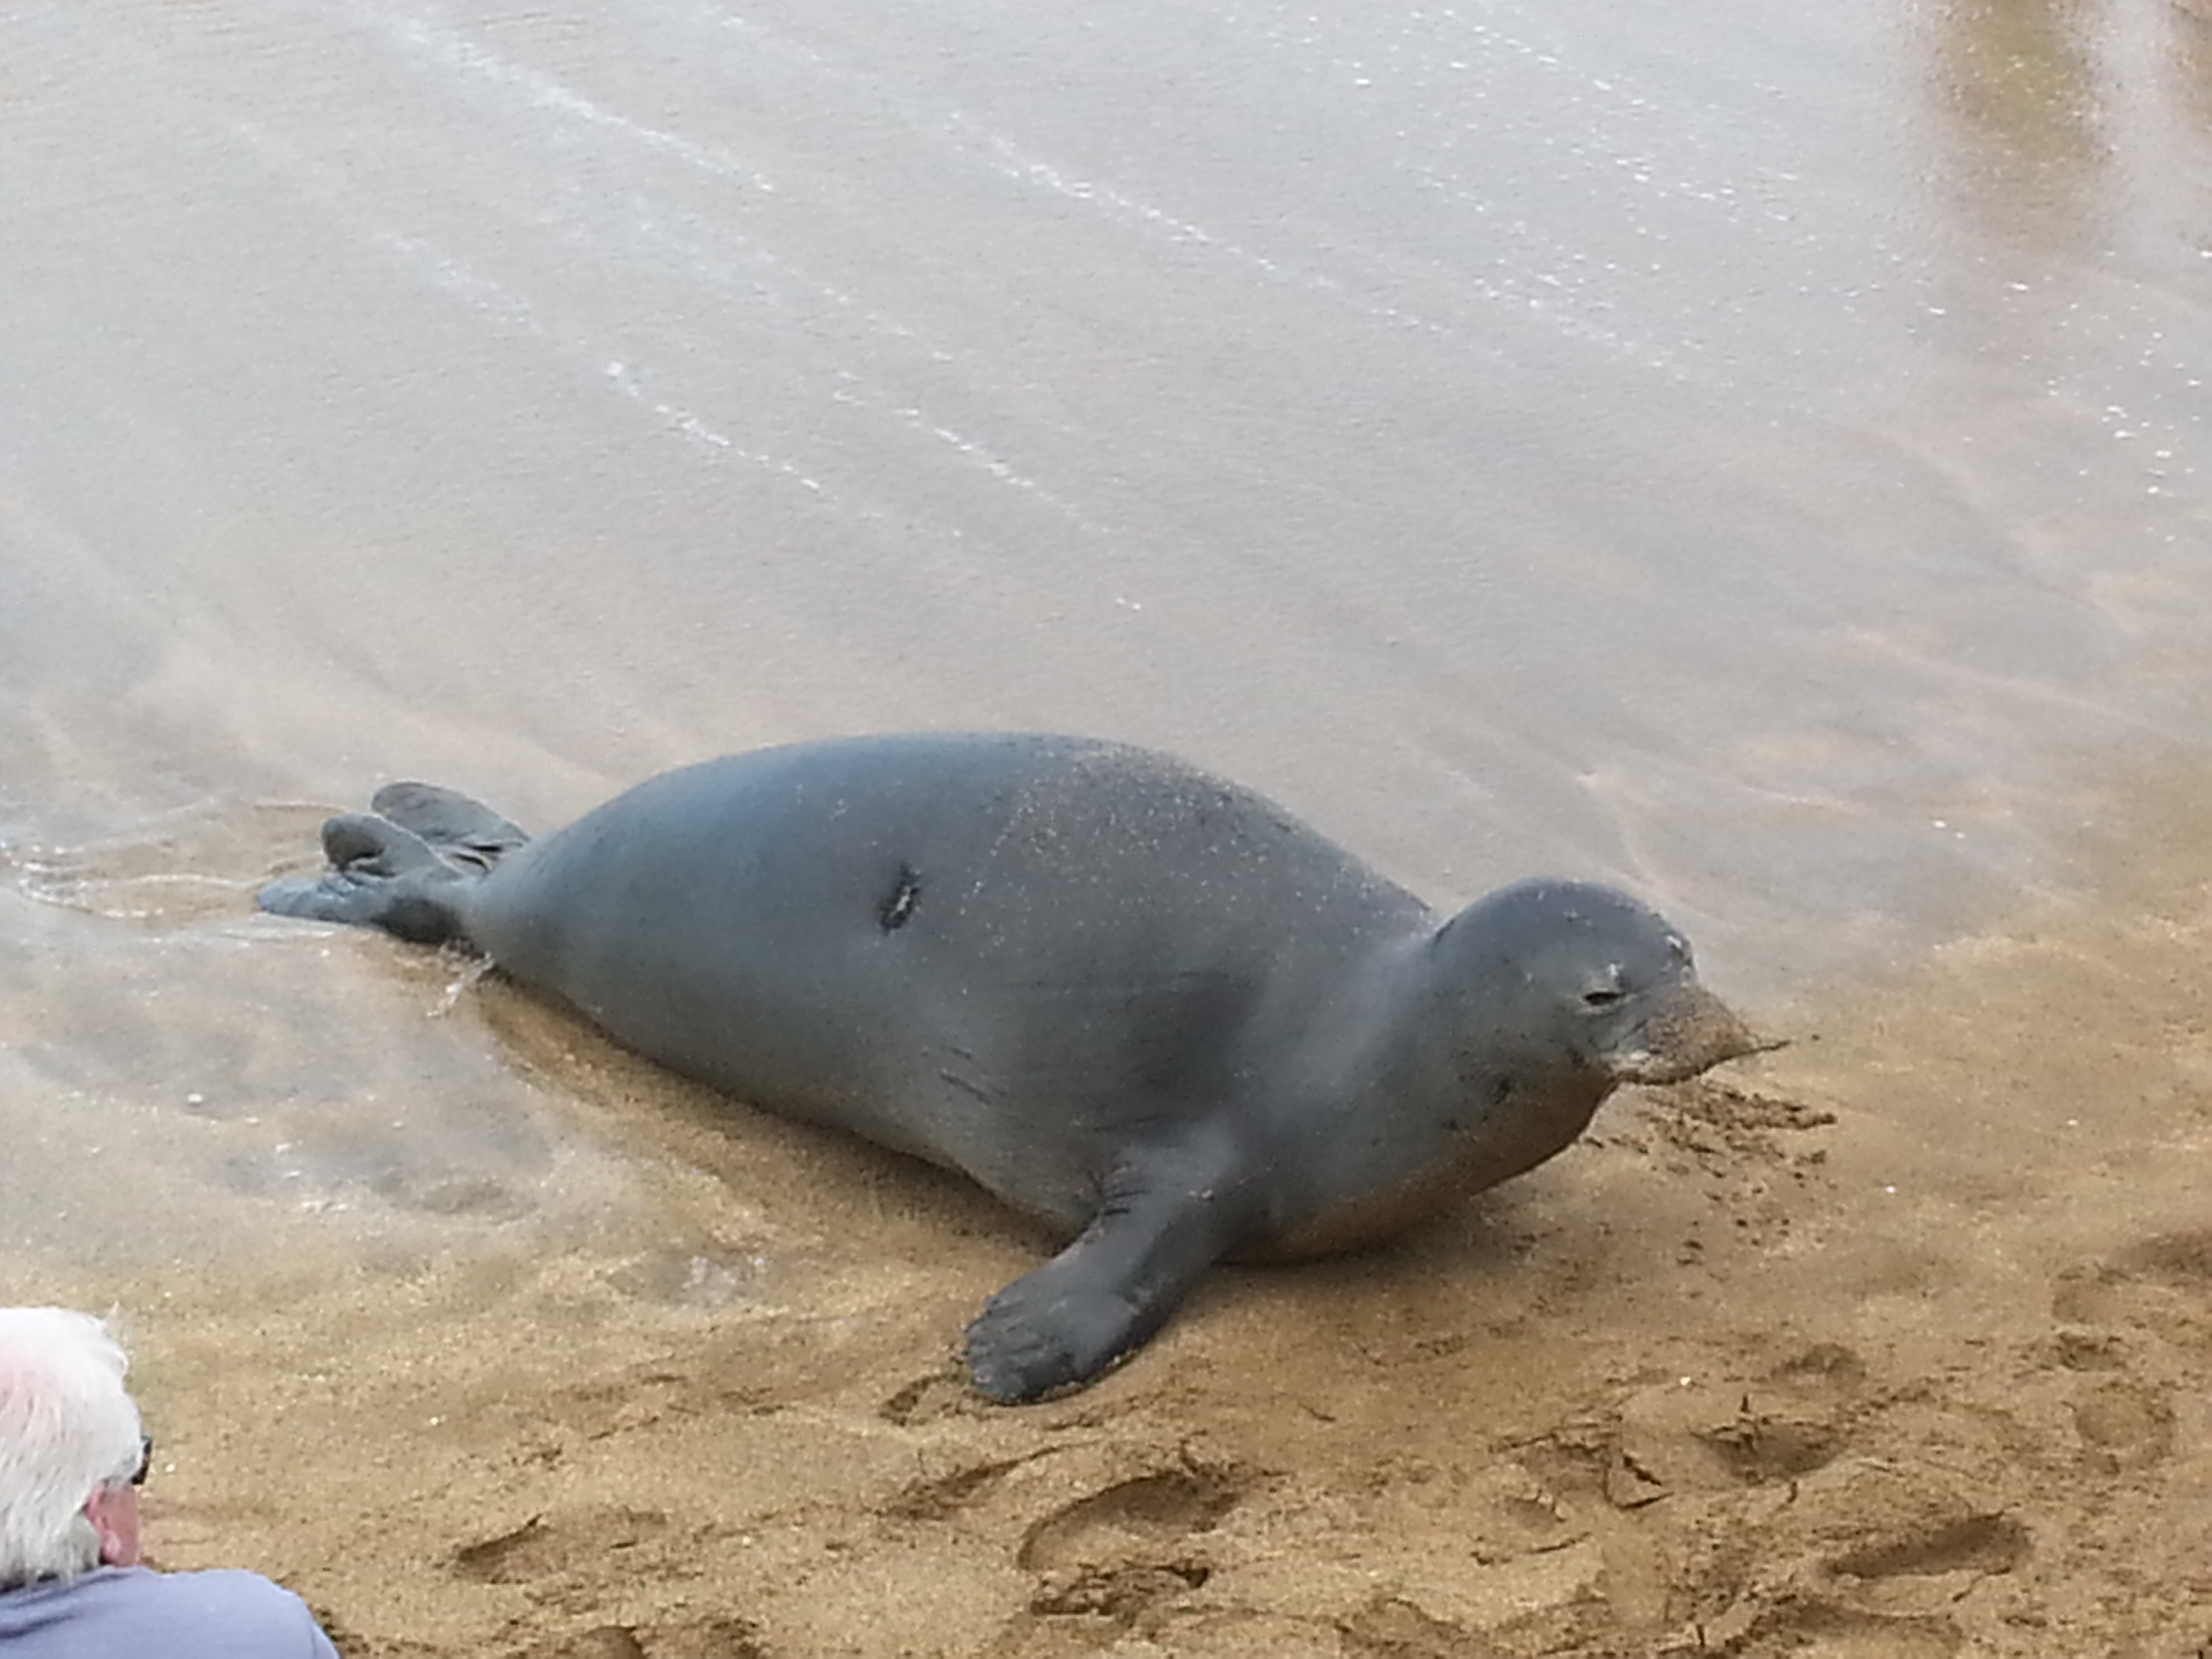 Hawaiian Monk Seal relaxes on the beach near Sands of Kahana Resort in West Maui